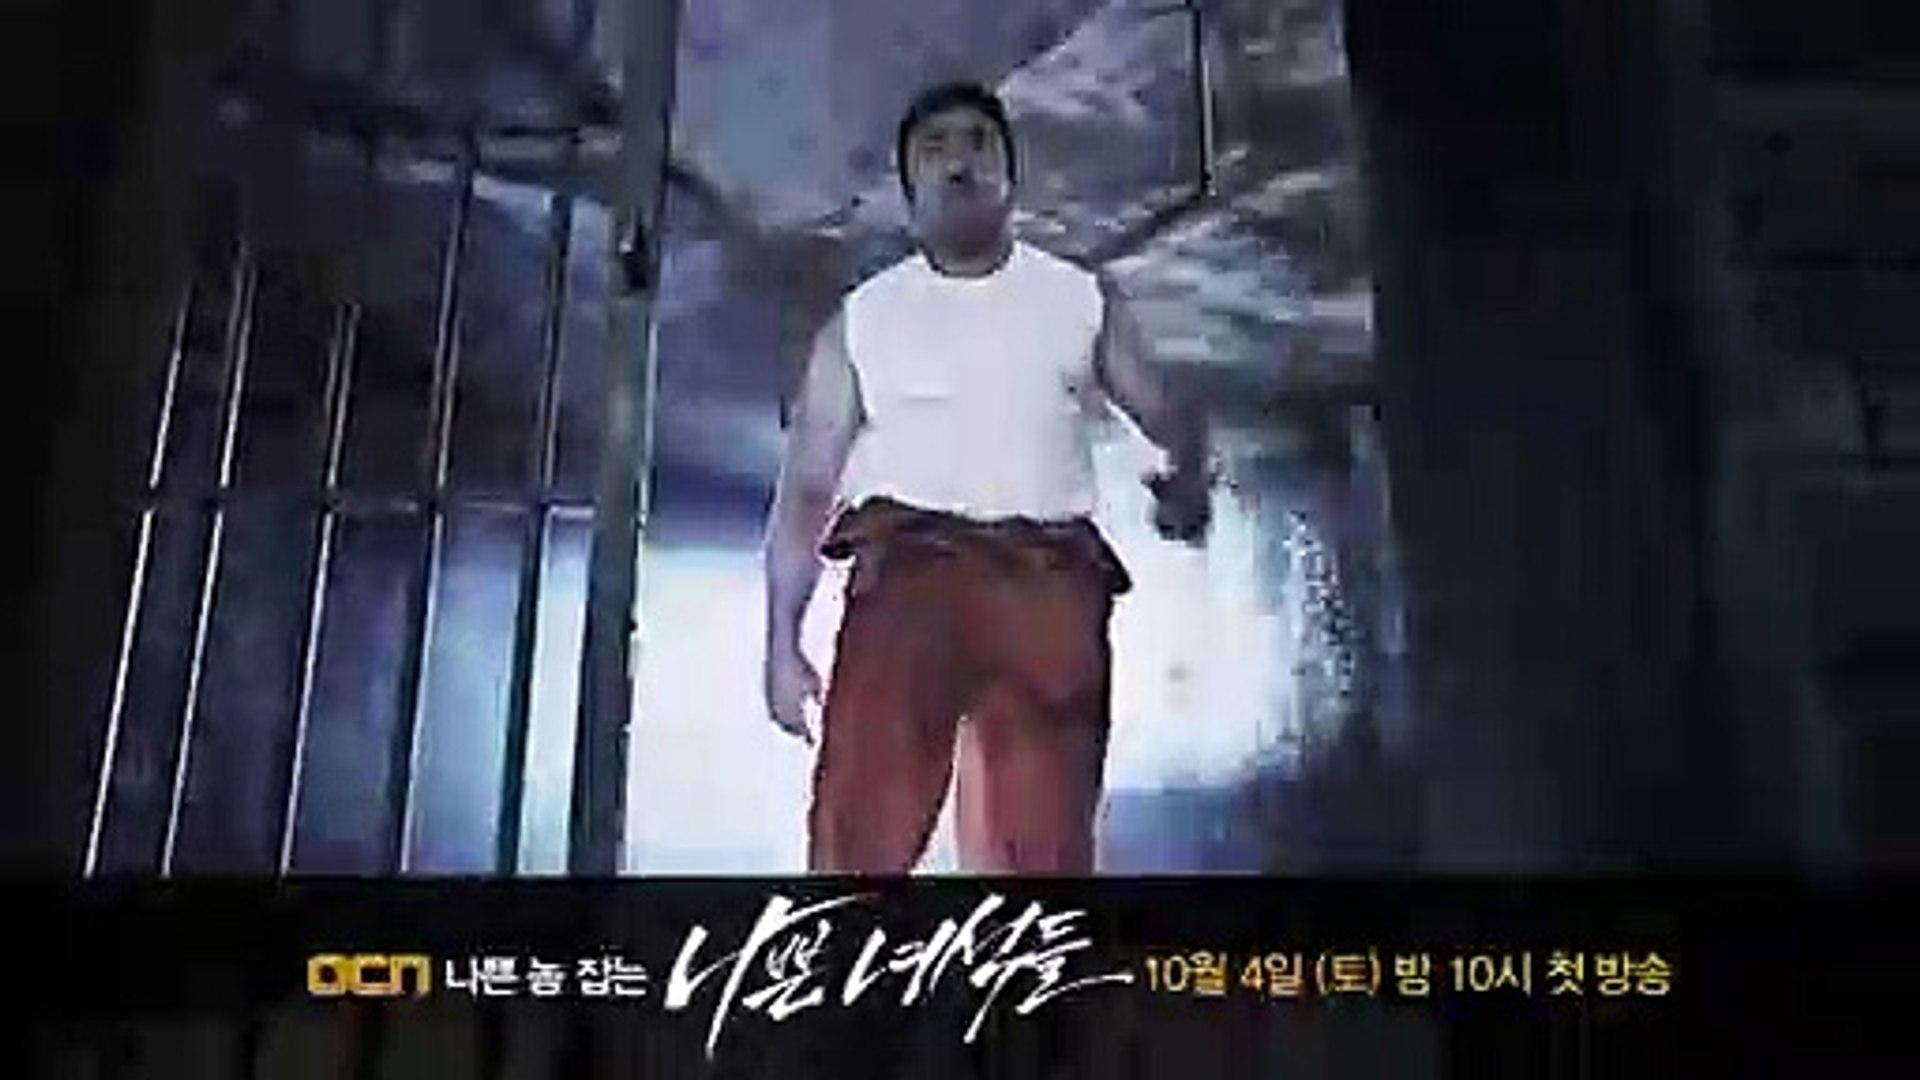 Park Hae Jin - Ocn 로고 , HD Wallpaper & Backgrounds